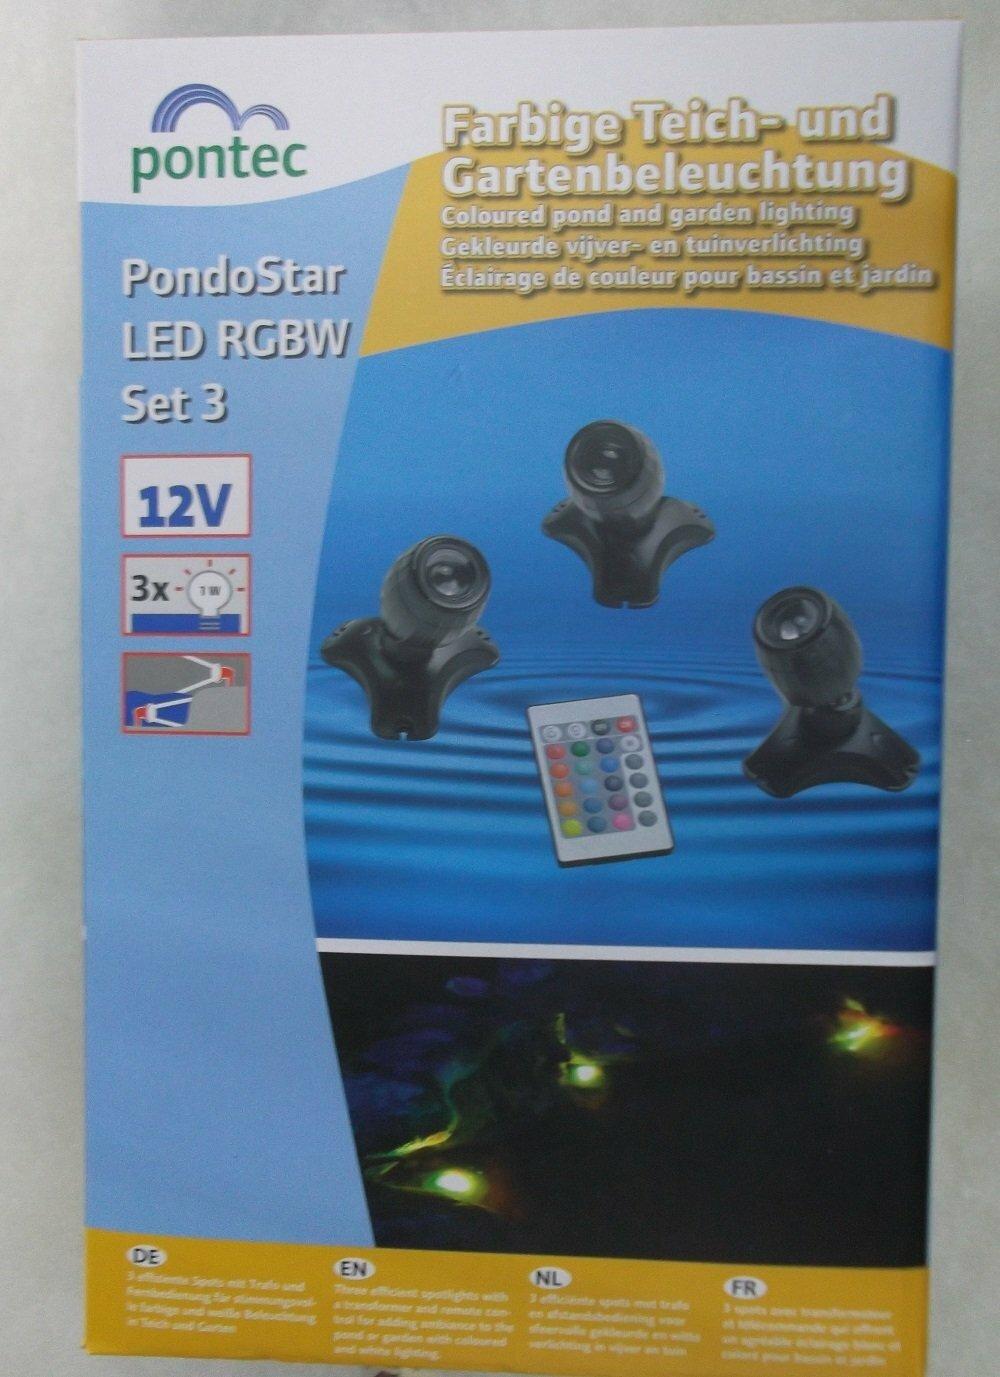 Pontec PondoStar LED RGBW Set 3 pond lights new for 2020